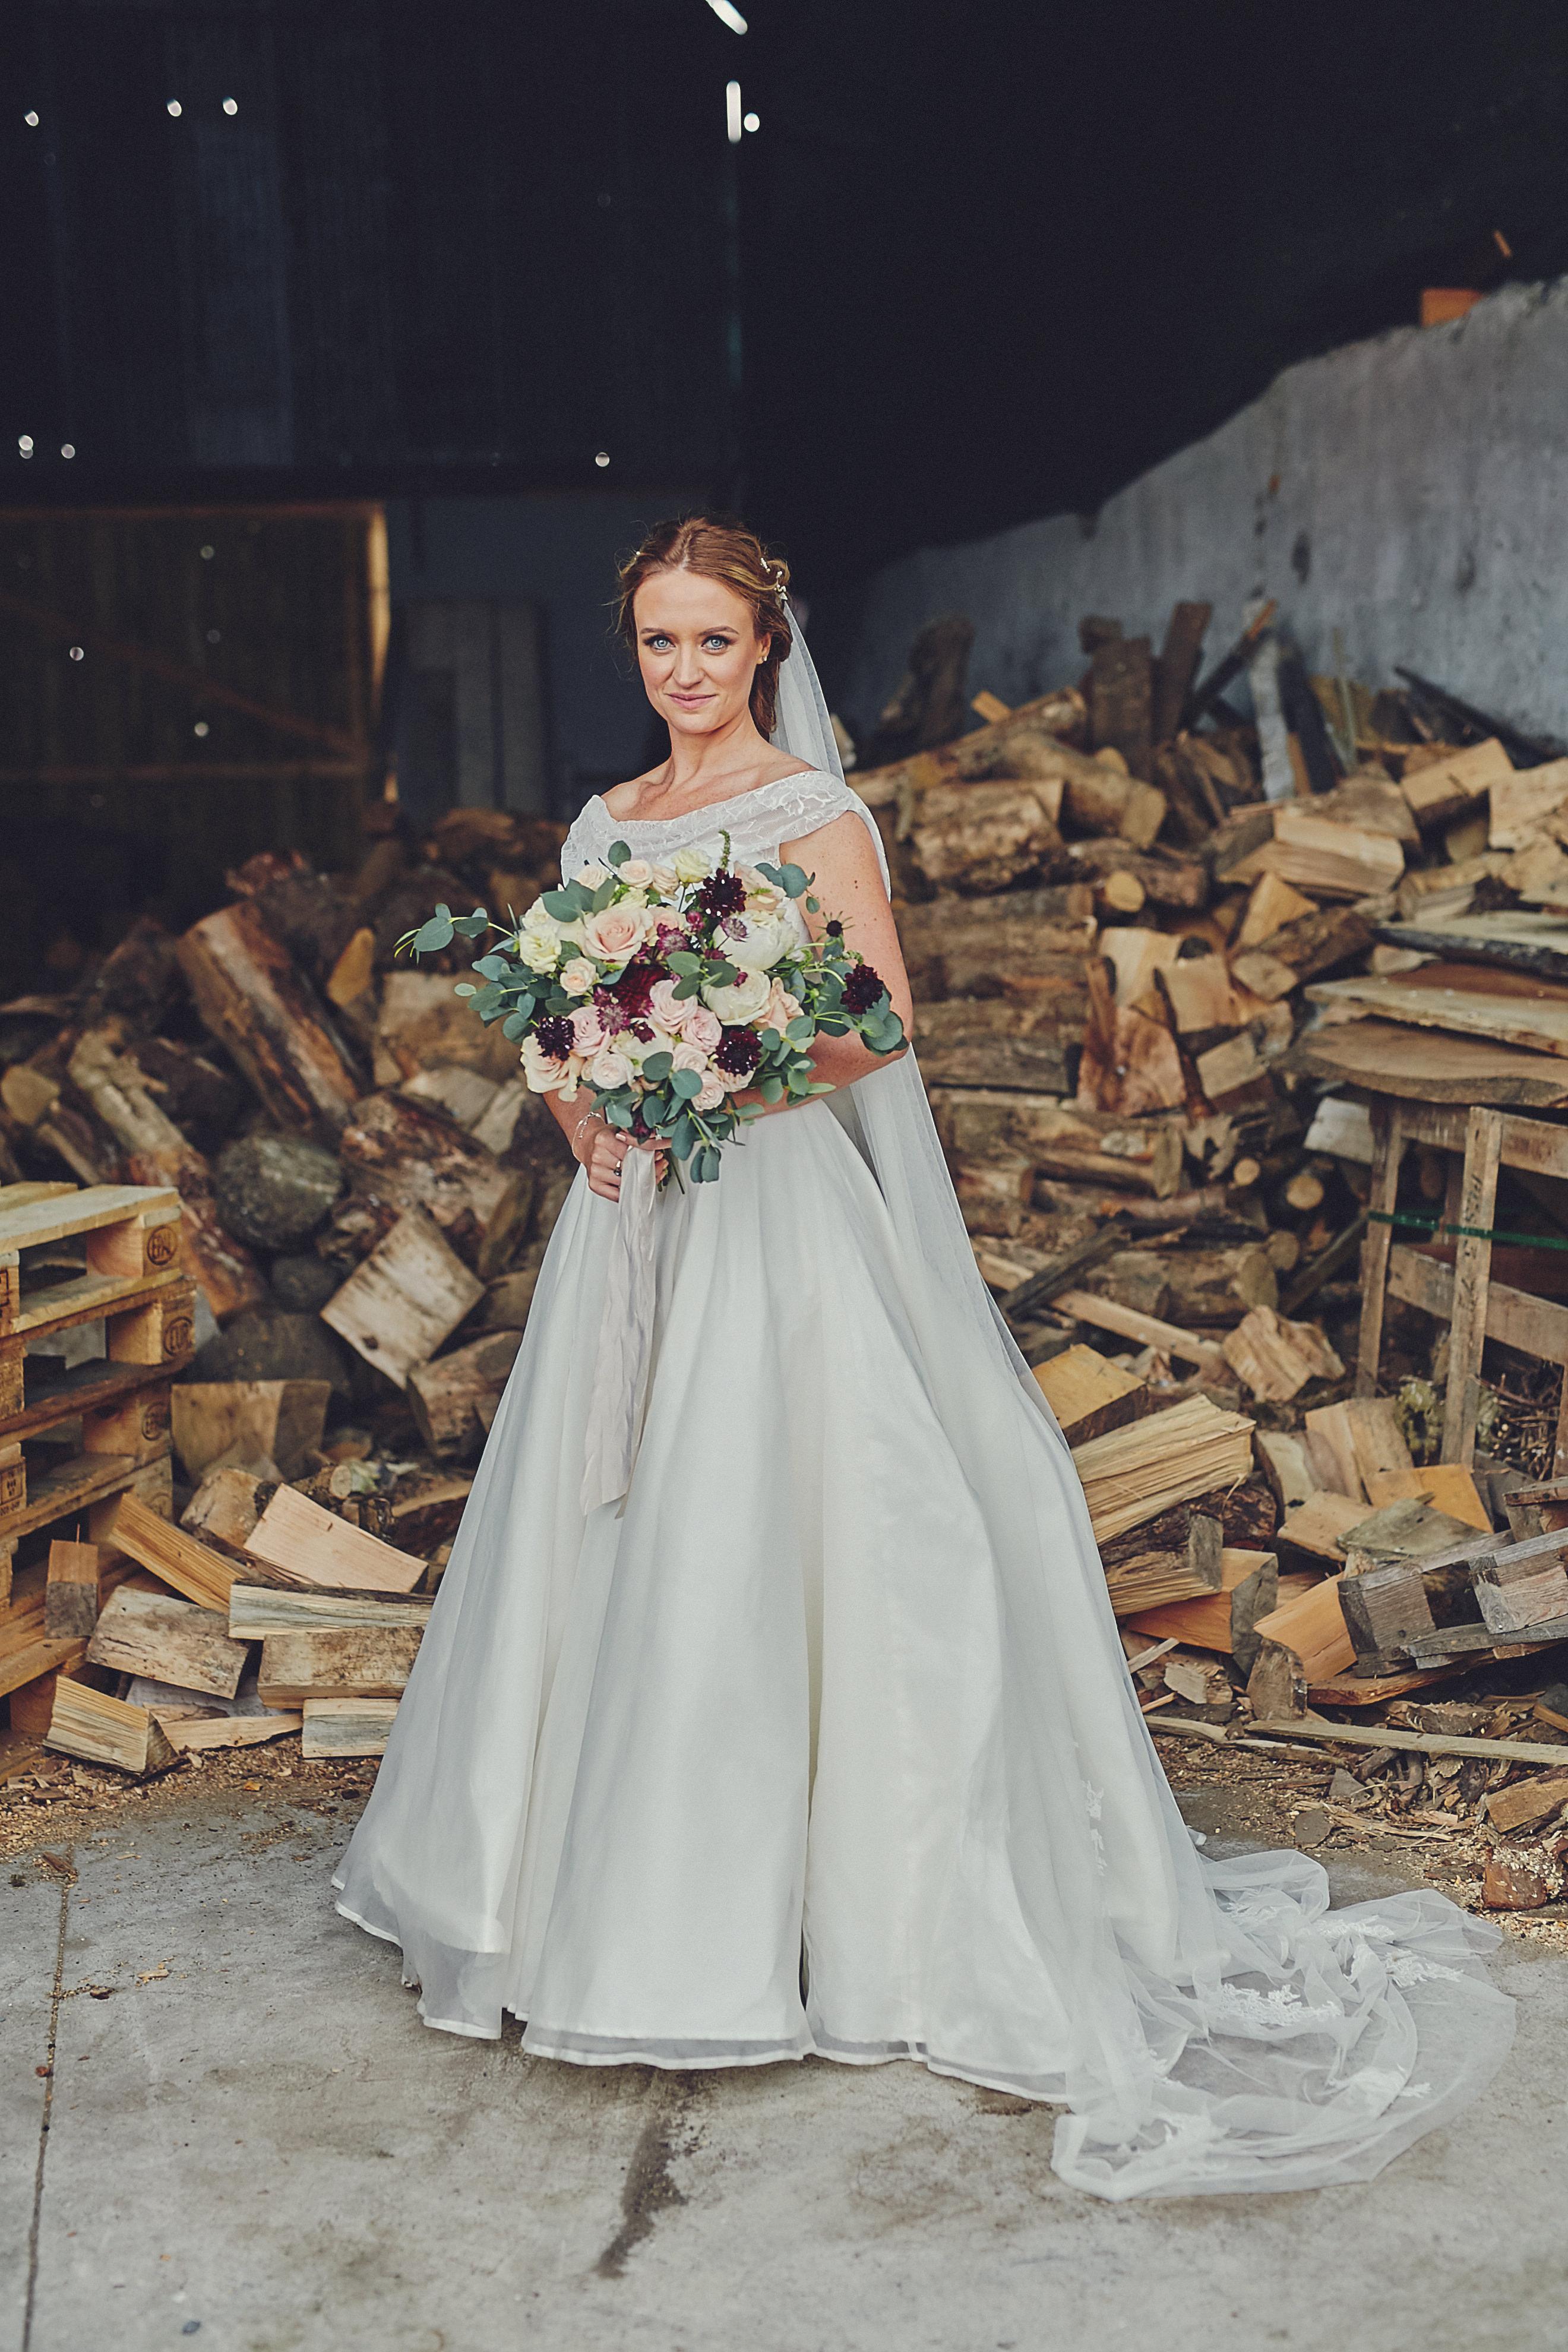 Cloughjordan House weddding110 - Cloughjordan House Wedding - Alternative Venue